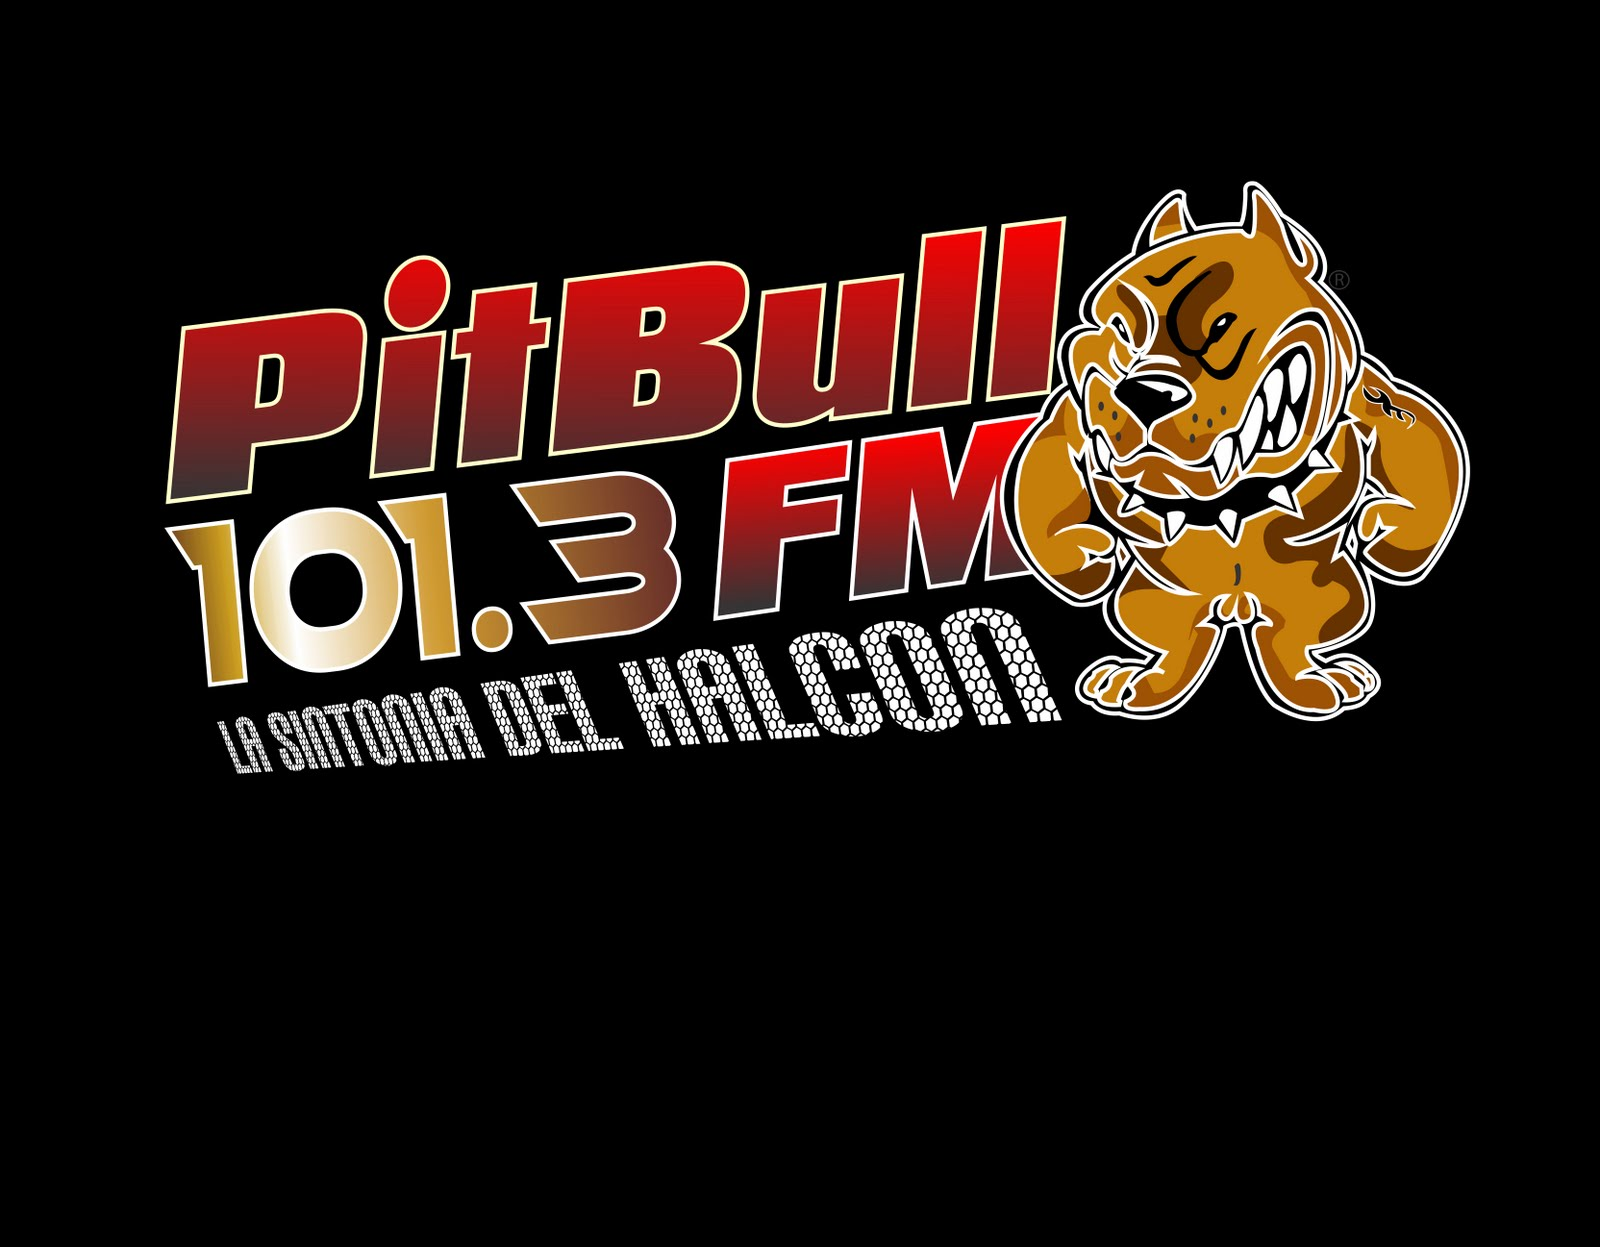 FM  PITBULL  101.3